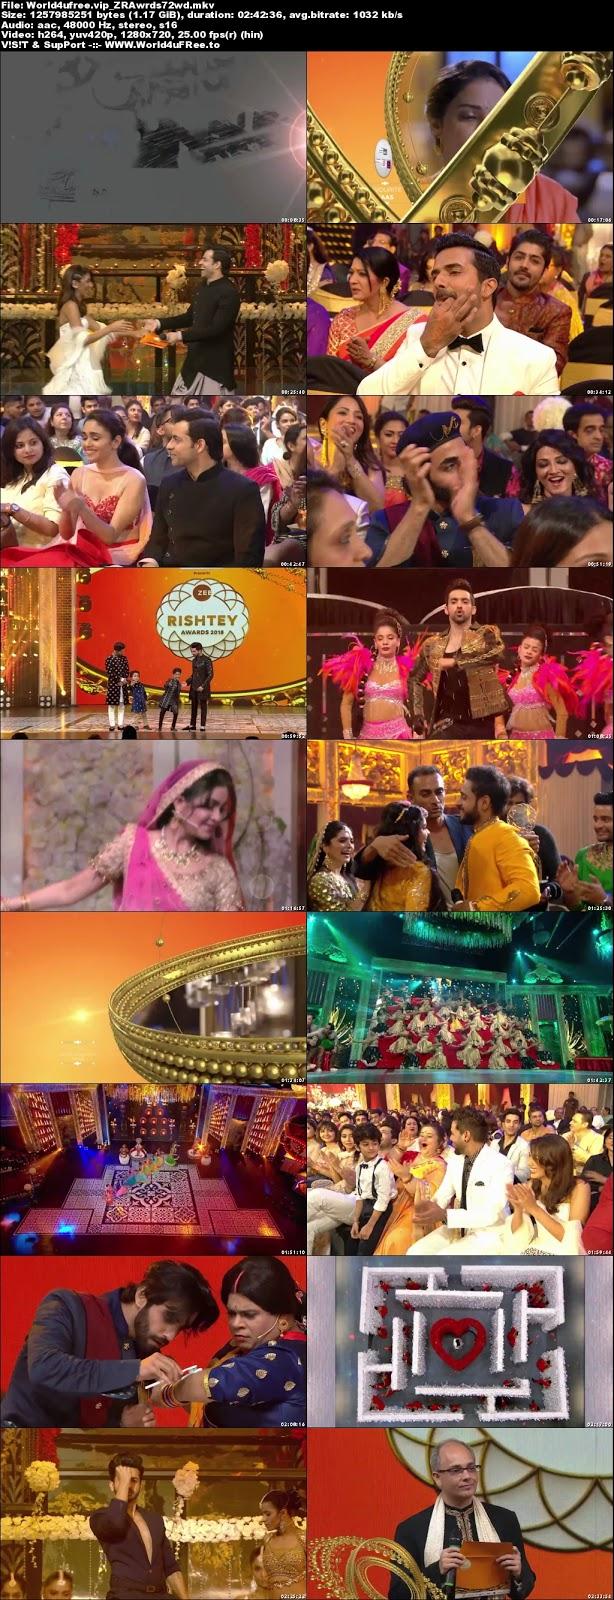 Zee Rishtay Awards 2018 Hindi 720p WEBHD 1.1Gb x264 world4ufree.vip tv show Zee Rishtay Awards 2018 Main Event hindi tv show tv show compressed small size free download or watch online at world4ufree.vip